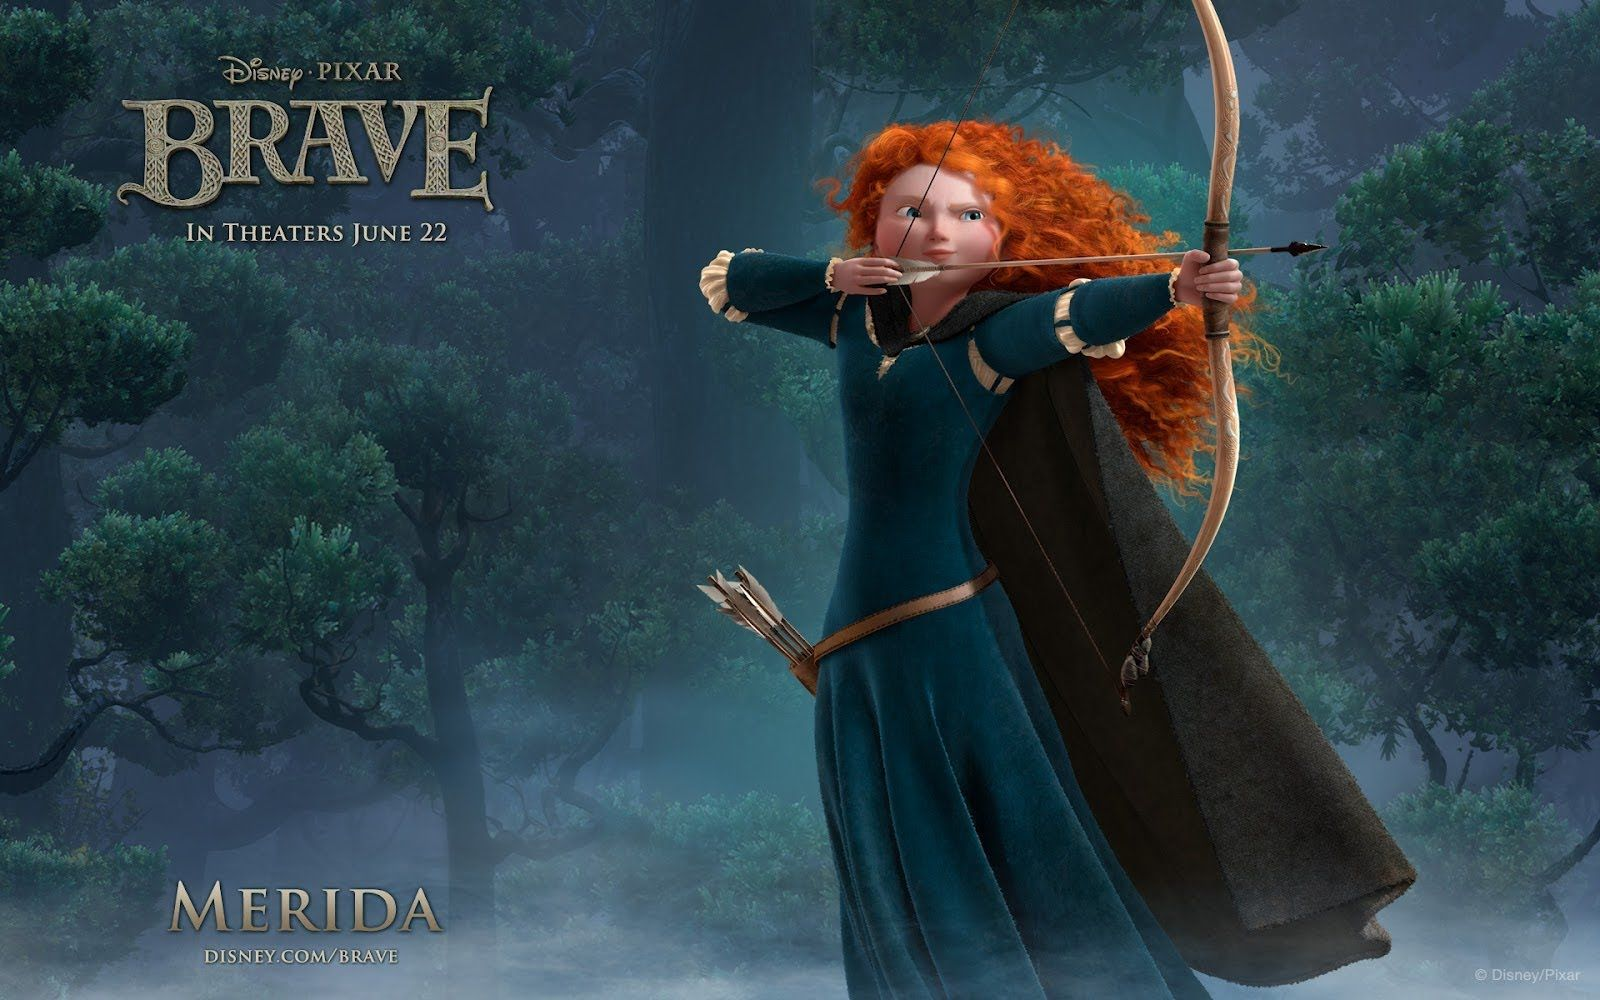 Valente Brave 2012 Filme Dublado Completo Princesa Merida Personagens Corajosos Filme Brave